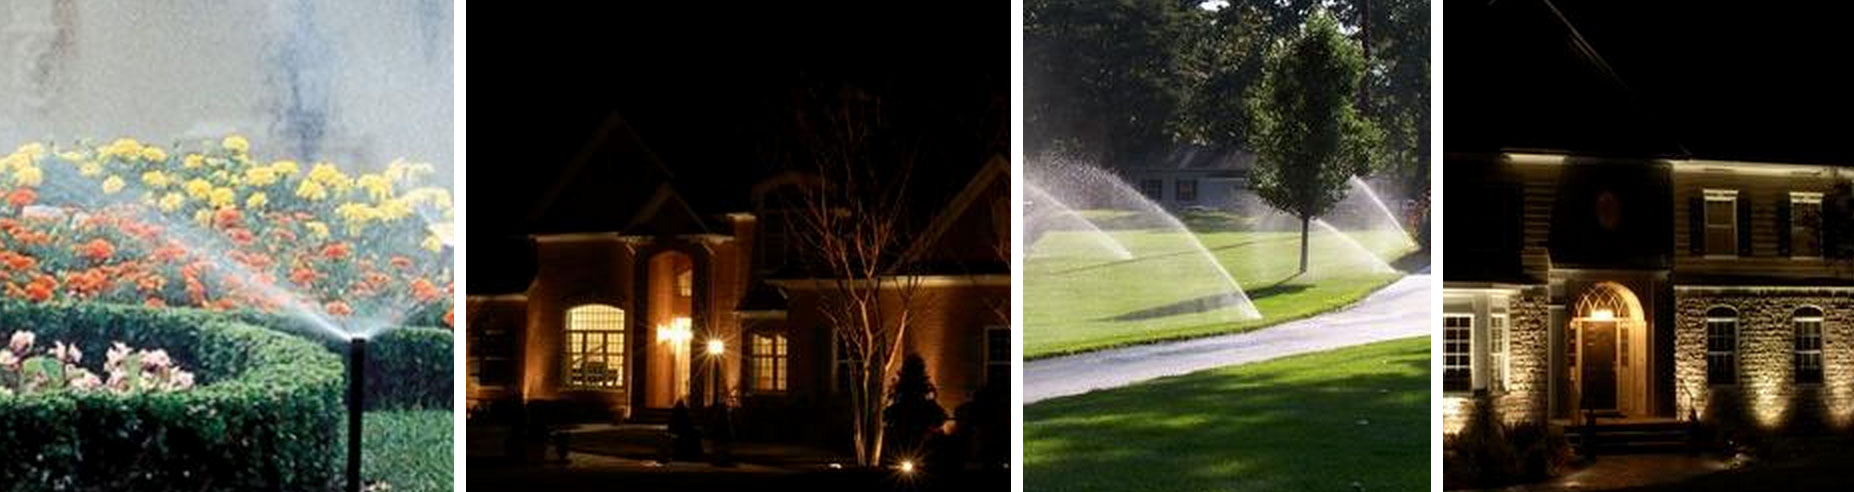 drainage services richmond va